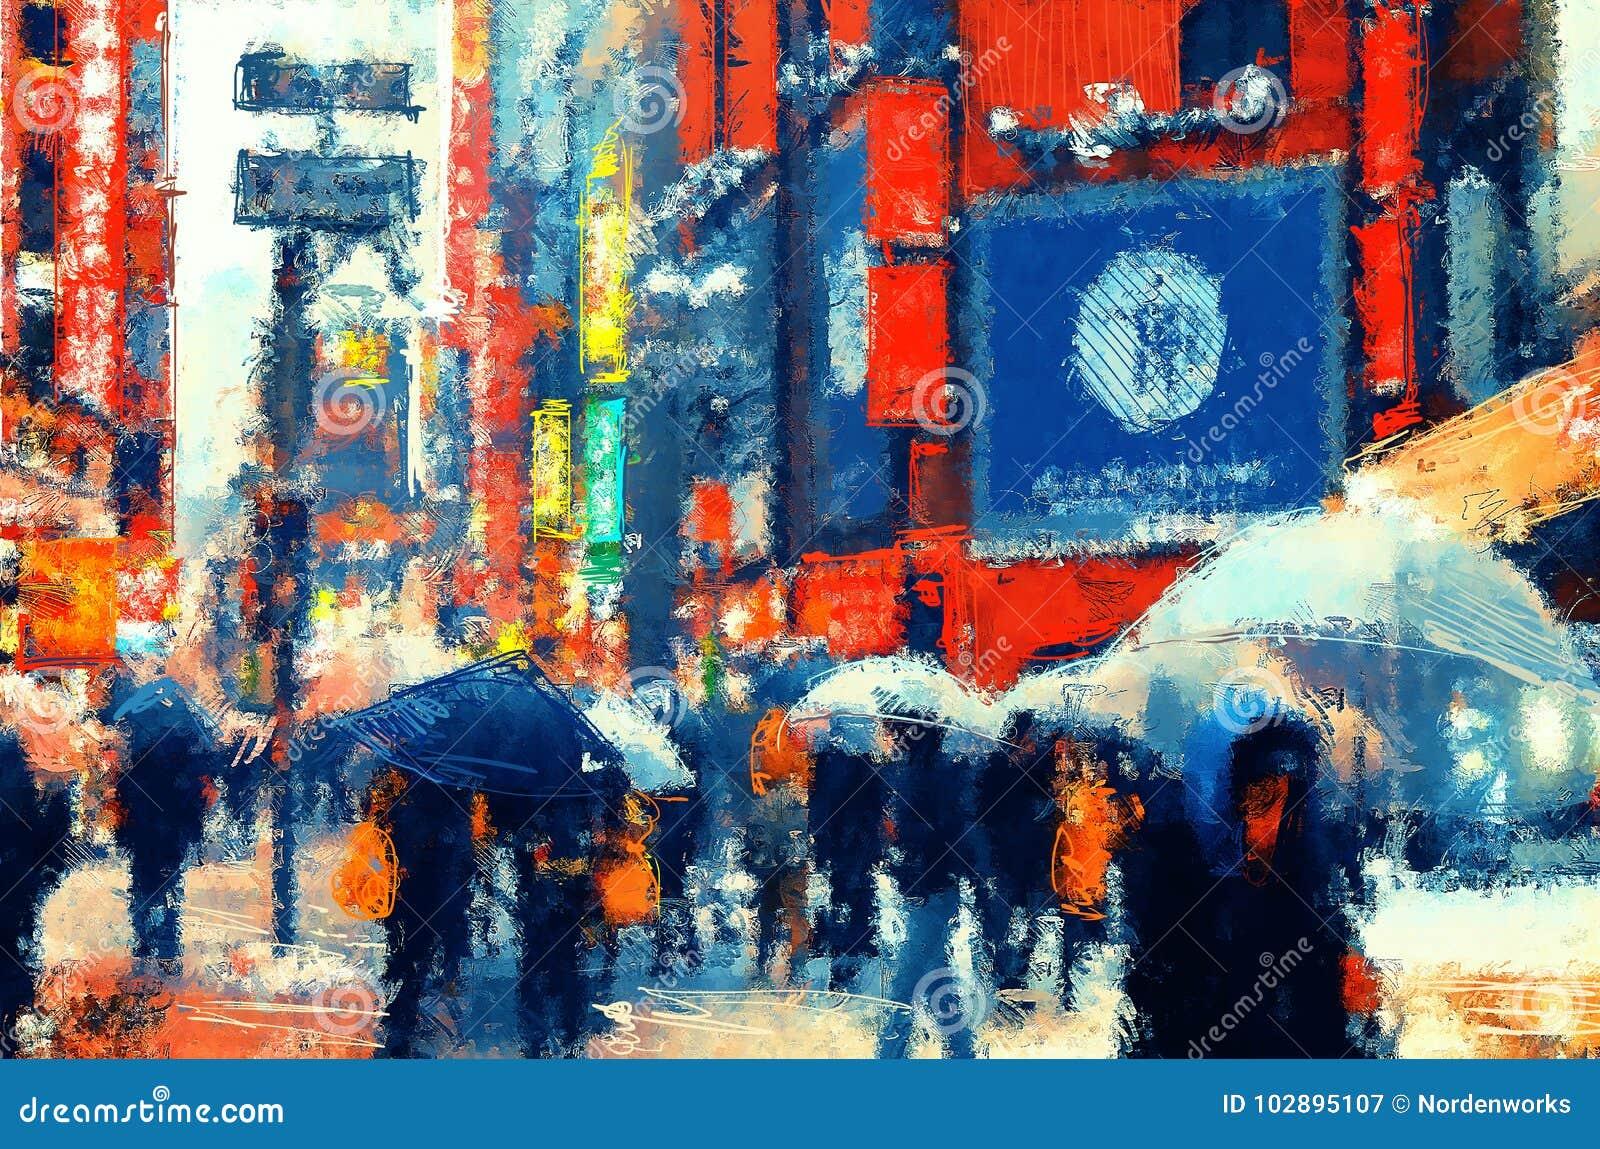 Japan People Walking On A Street Illustration Painting